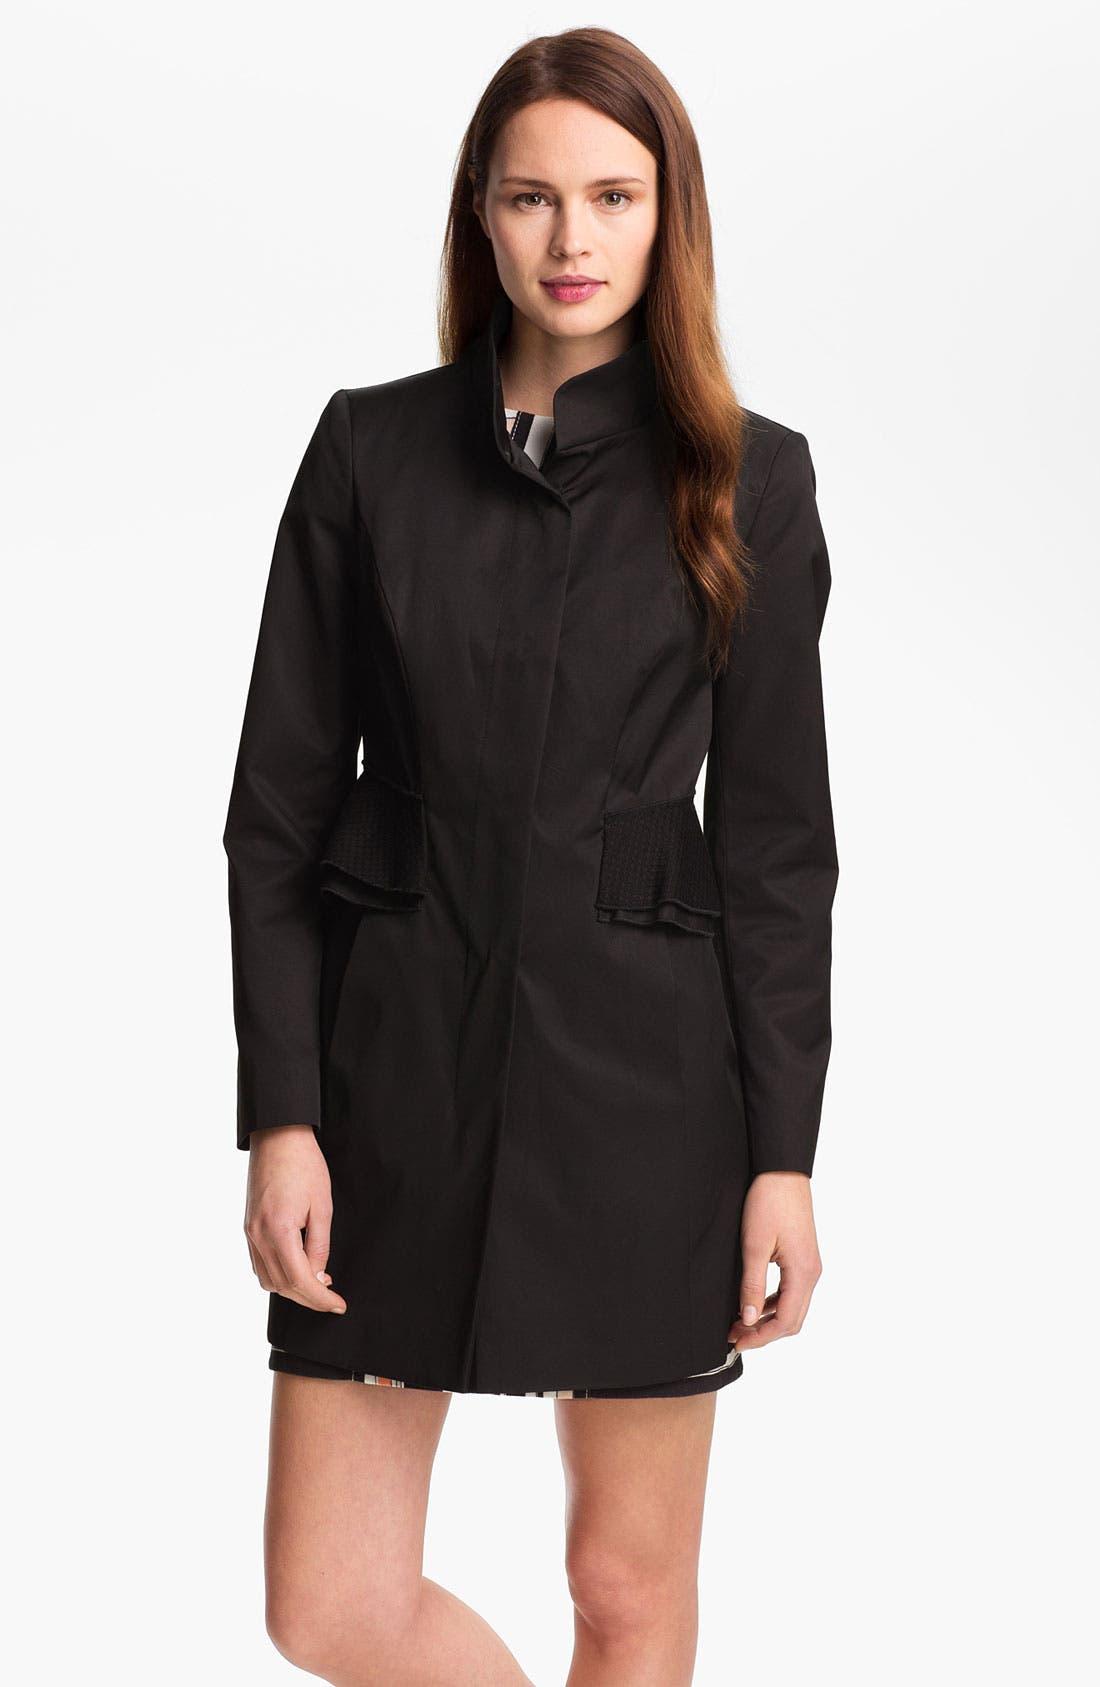 Alternate Image 1 Selected - Tahari 'Jenna' Peplum Walking Coat (Online Only)